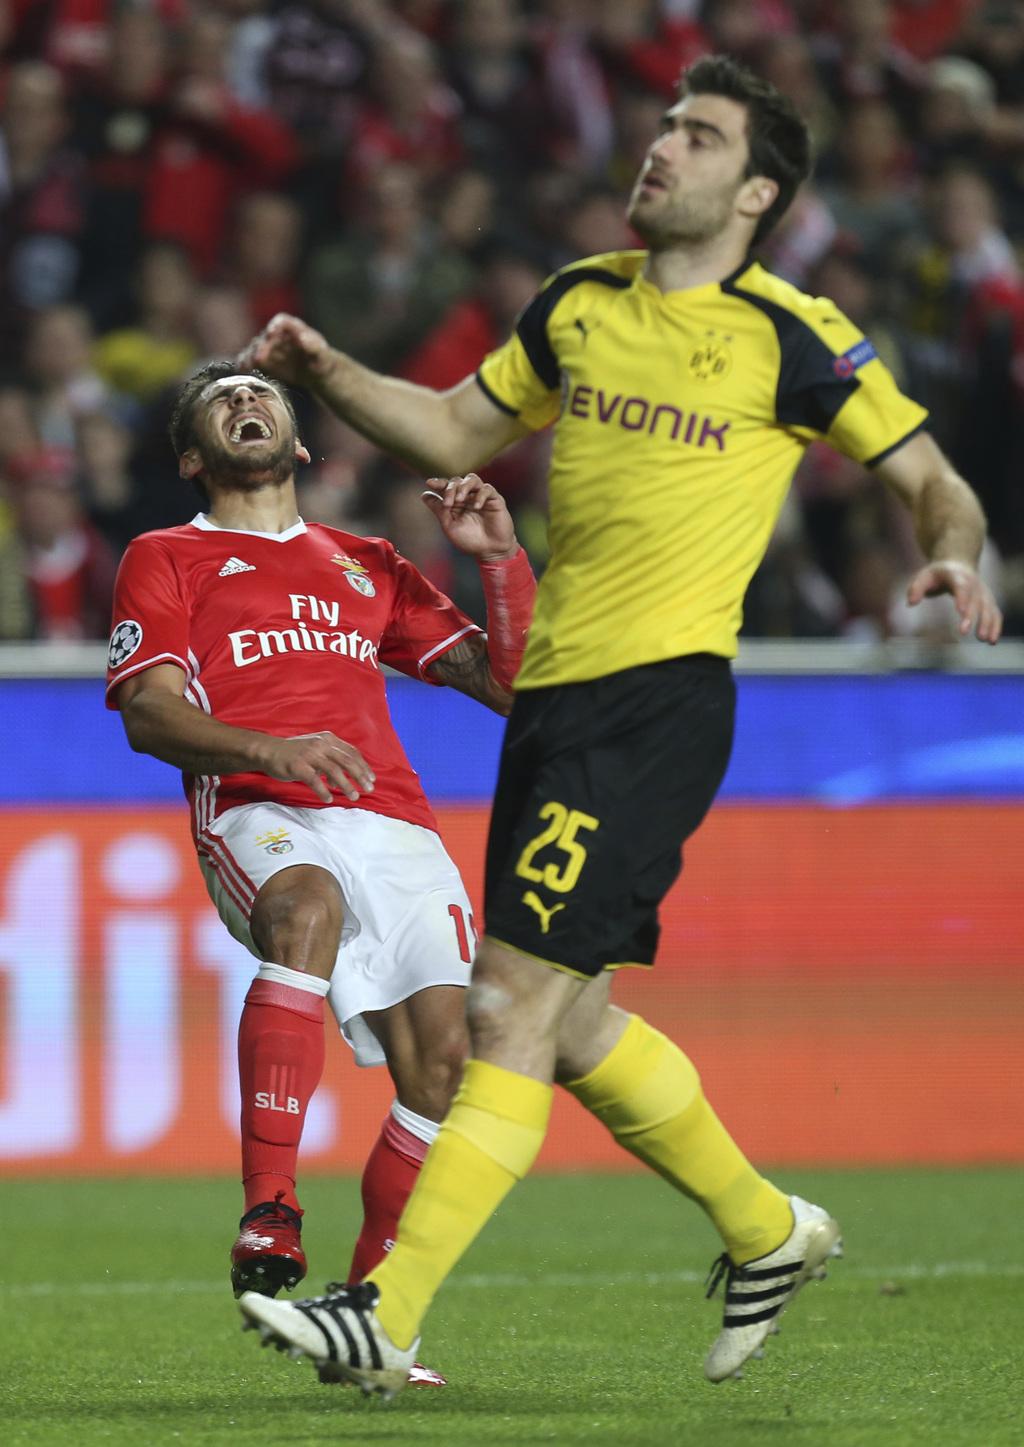 Benfica's Eduardo Salvio reacts next to Dortmund's Sokratis Papastathopoulos during the Champions League round of 16, first leg, soccer...